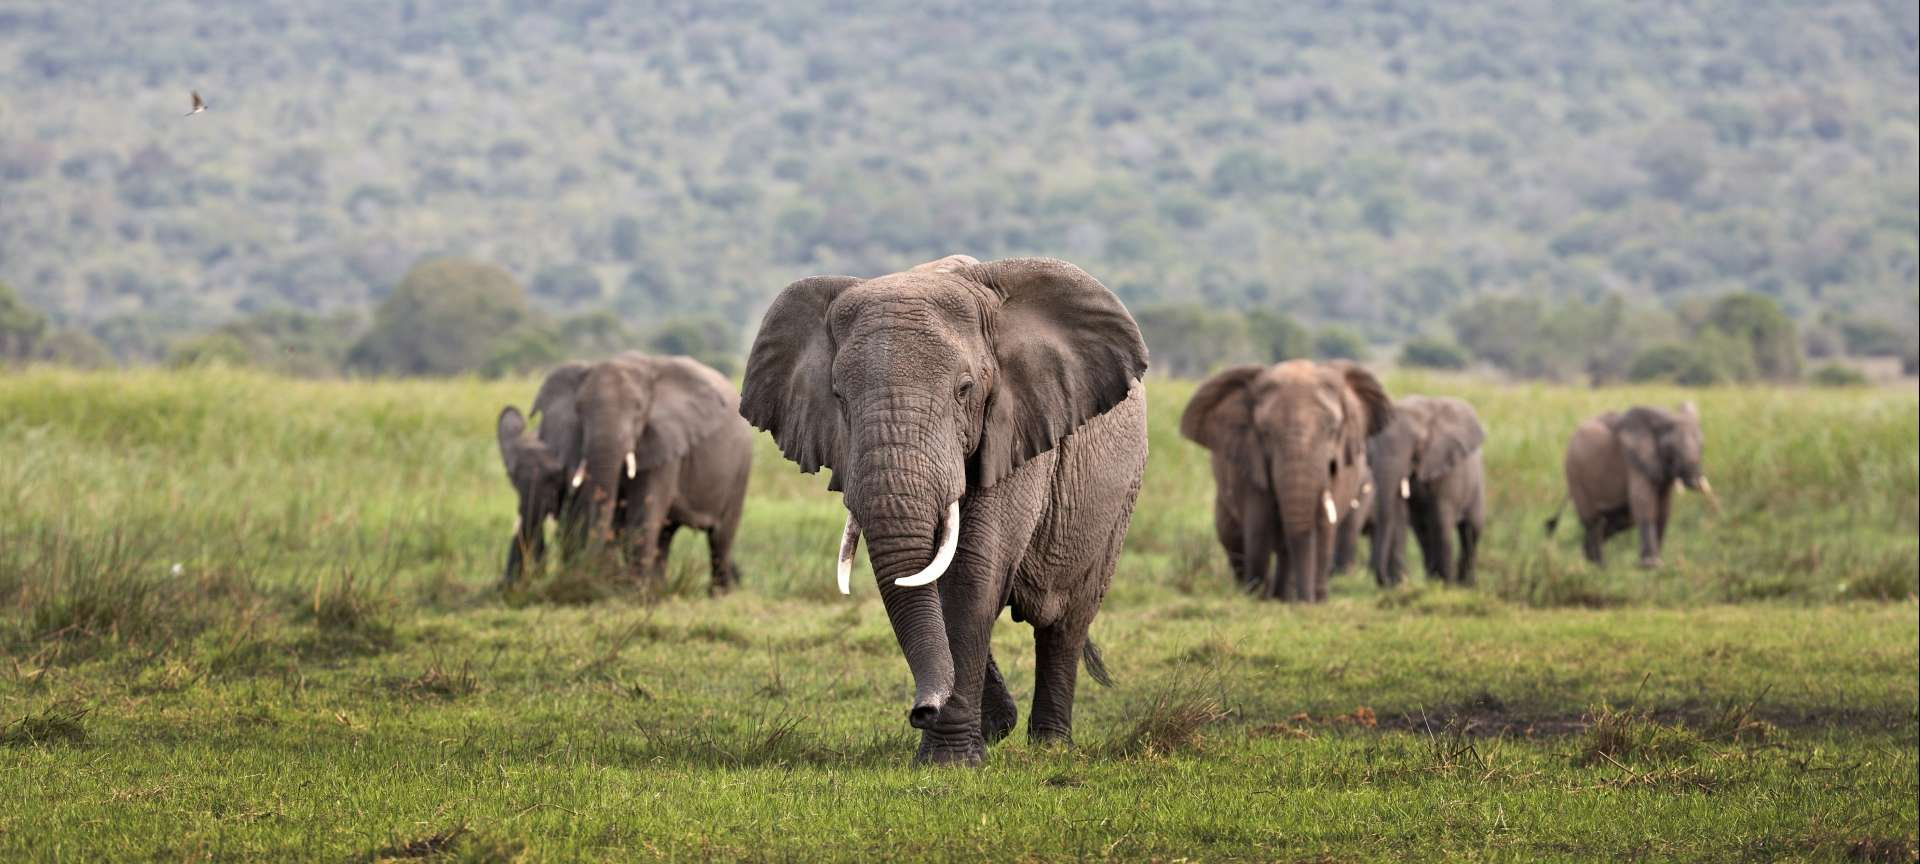 Rwanda - Africa Wildlife Safaris